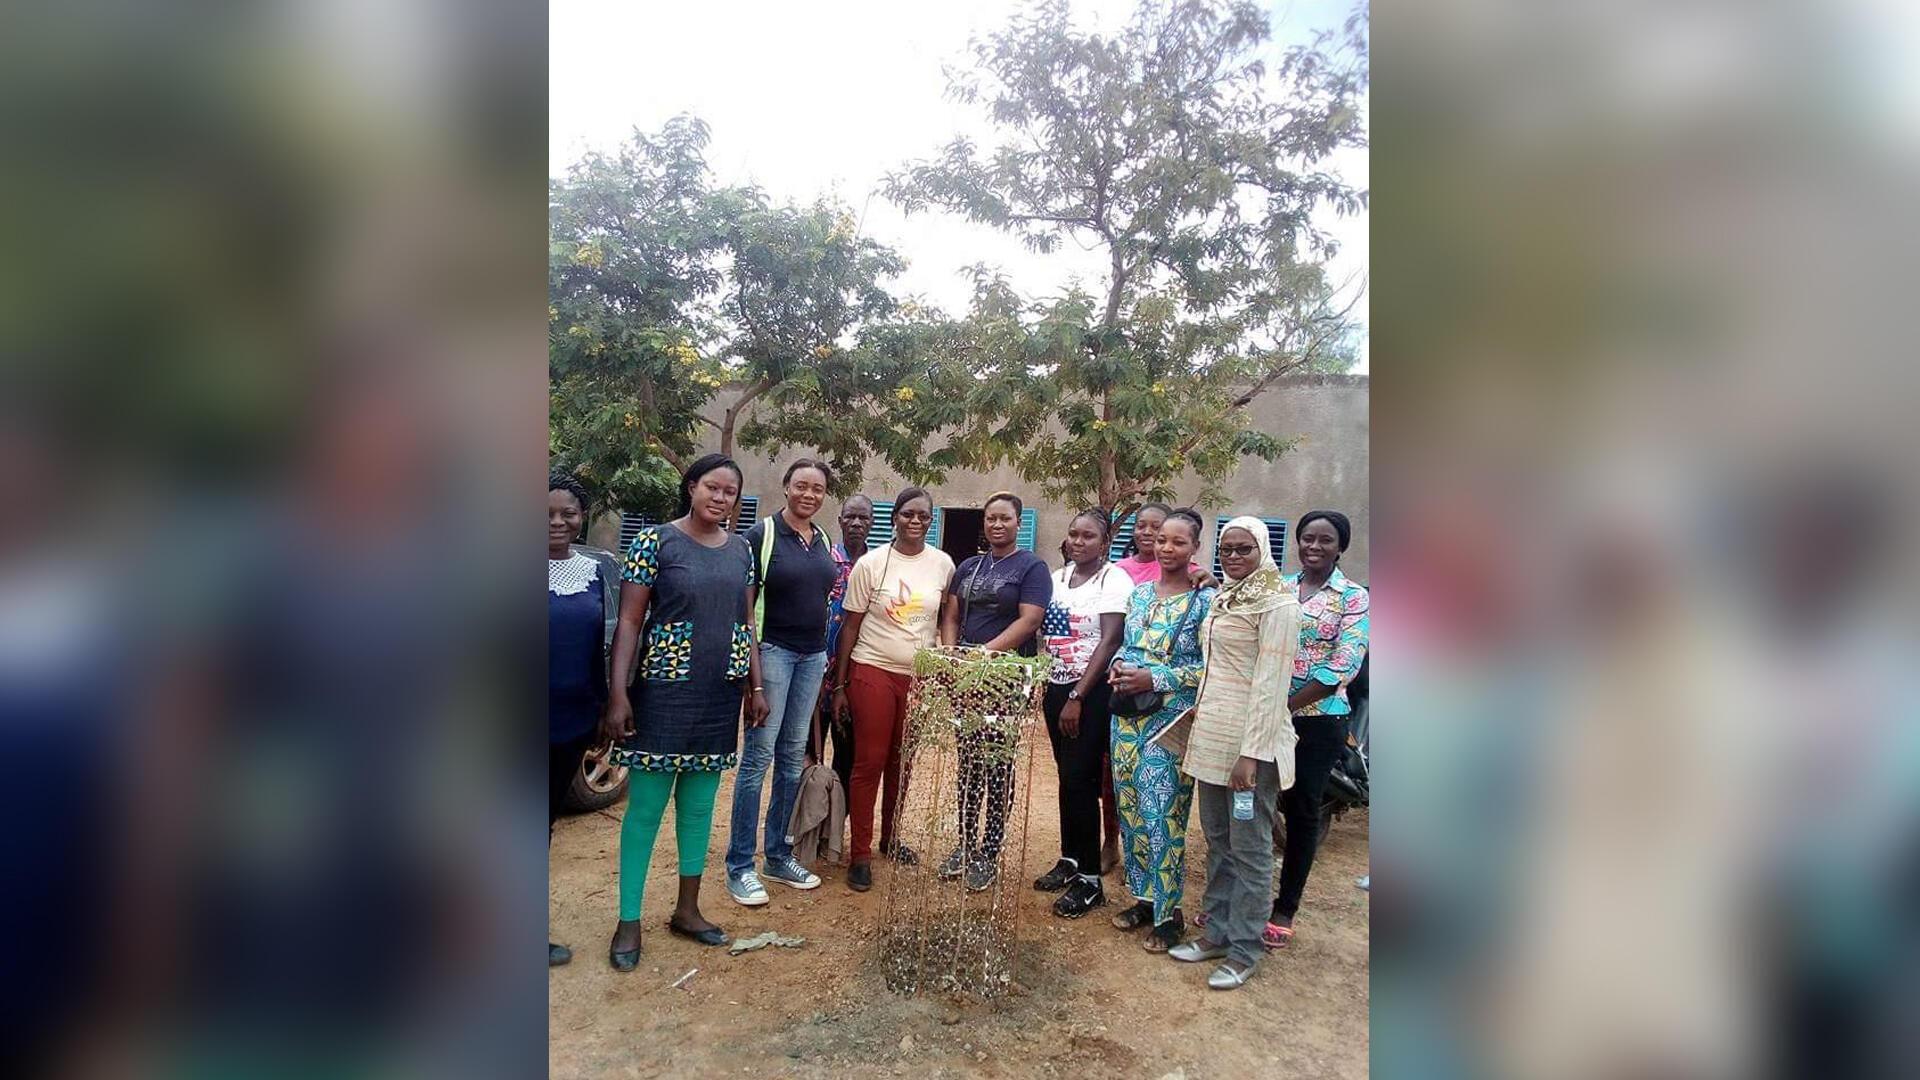 Association des femmes environnementaliste, au Burkina Faso.